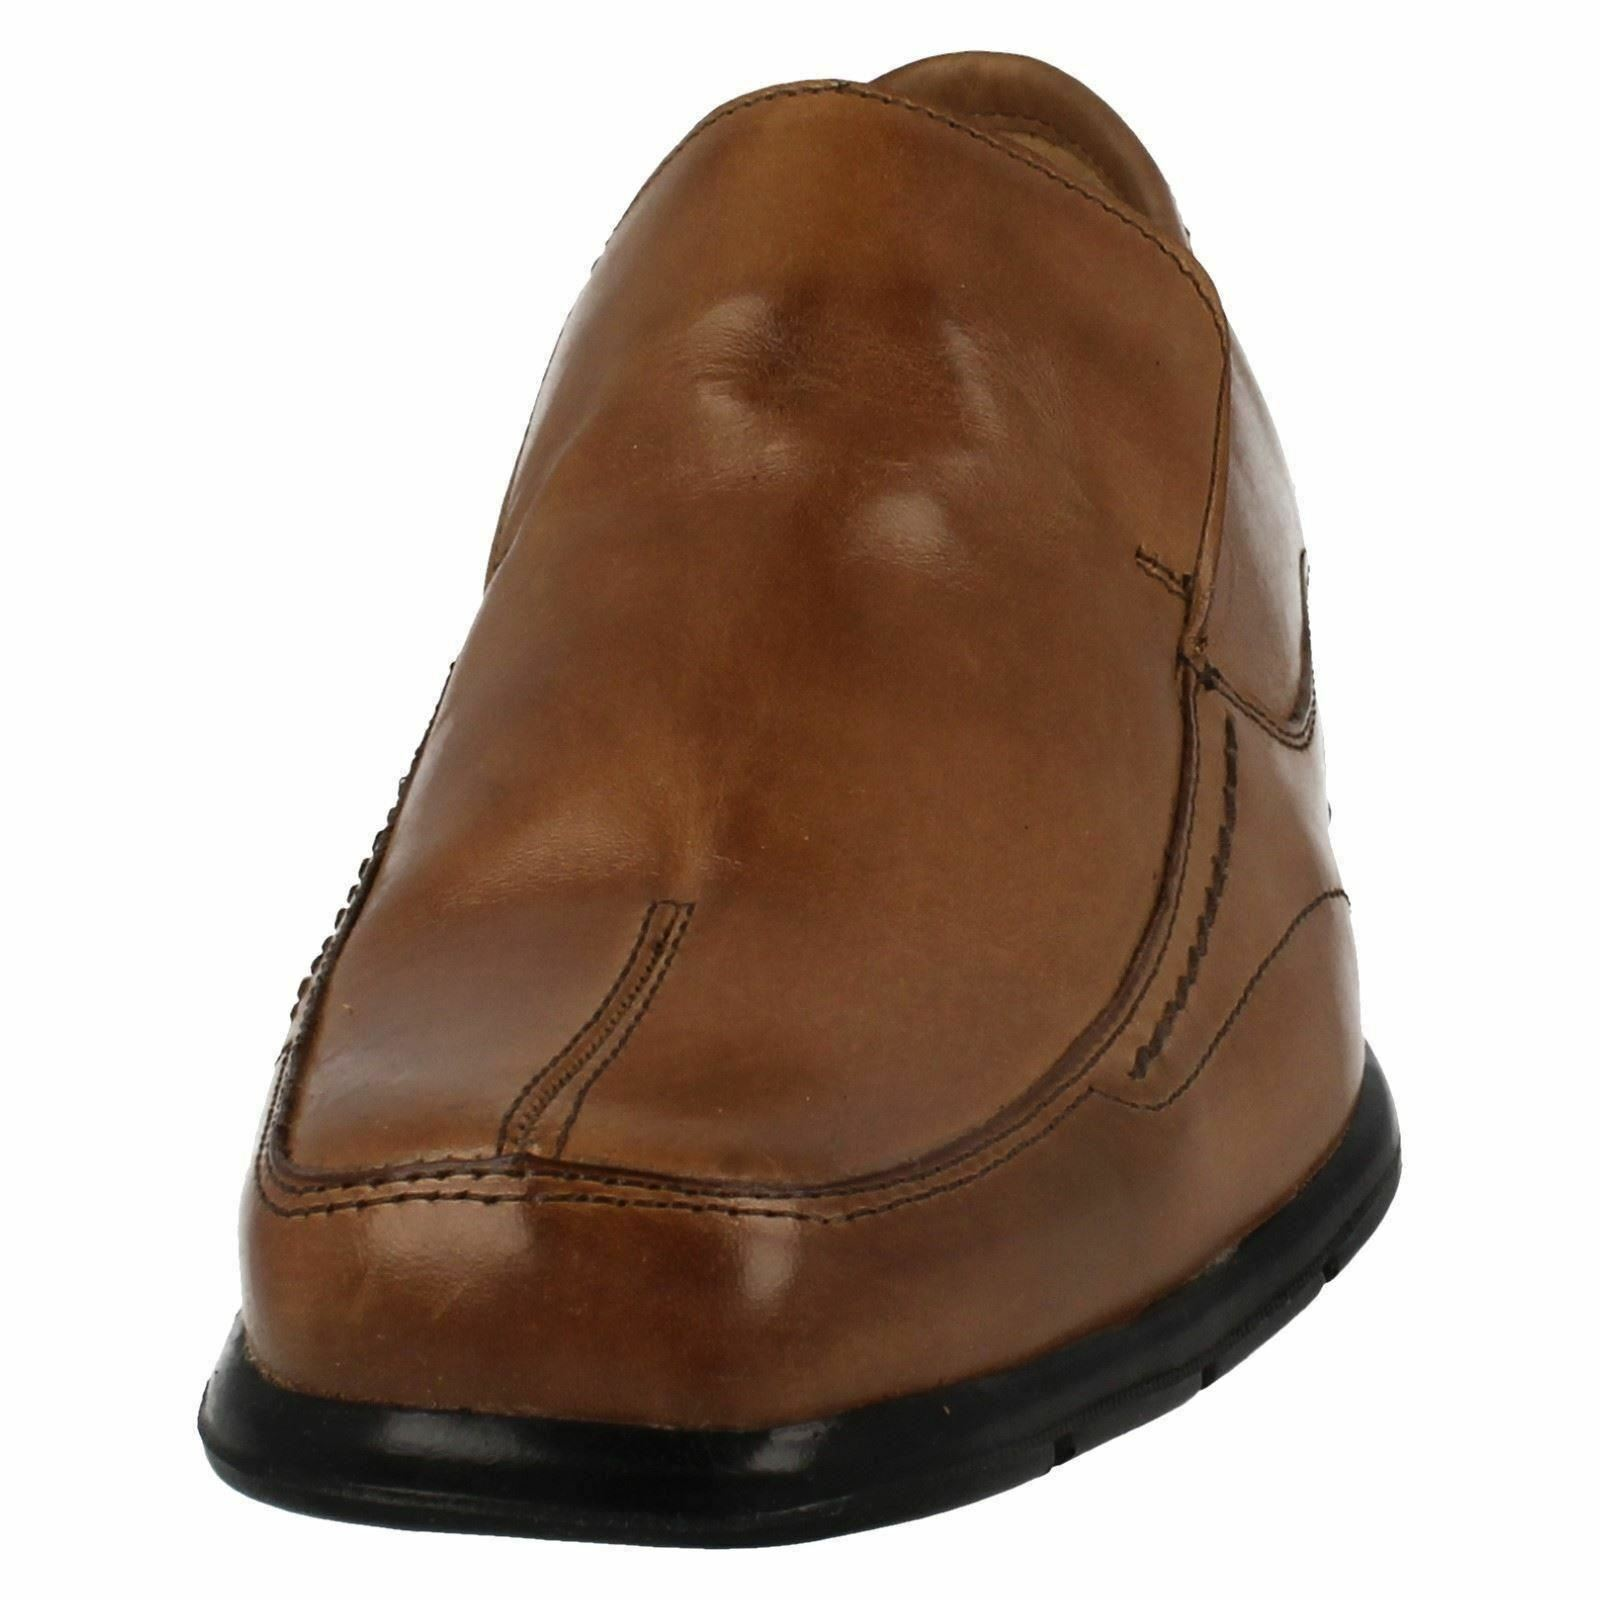 Mens Anatomic & Co Bronze Petropolis 323251 schwarz Or Bronze Co Leder Smart Slip On Schuhes da3fe7